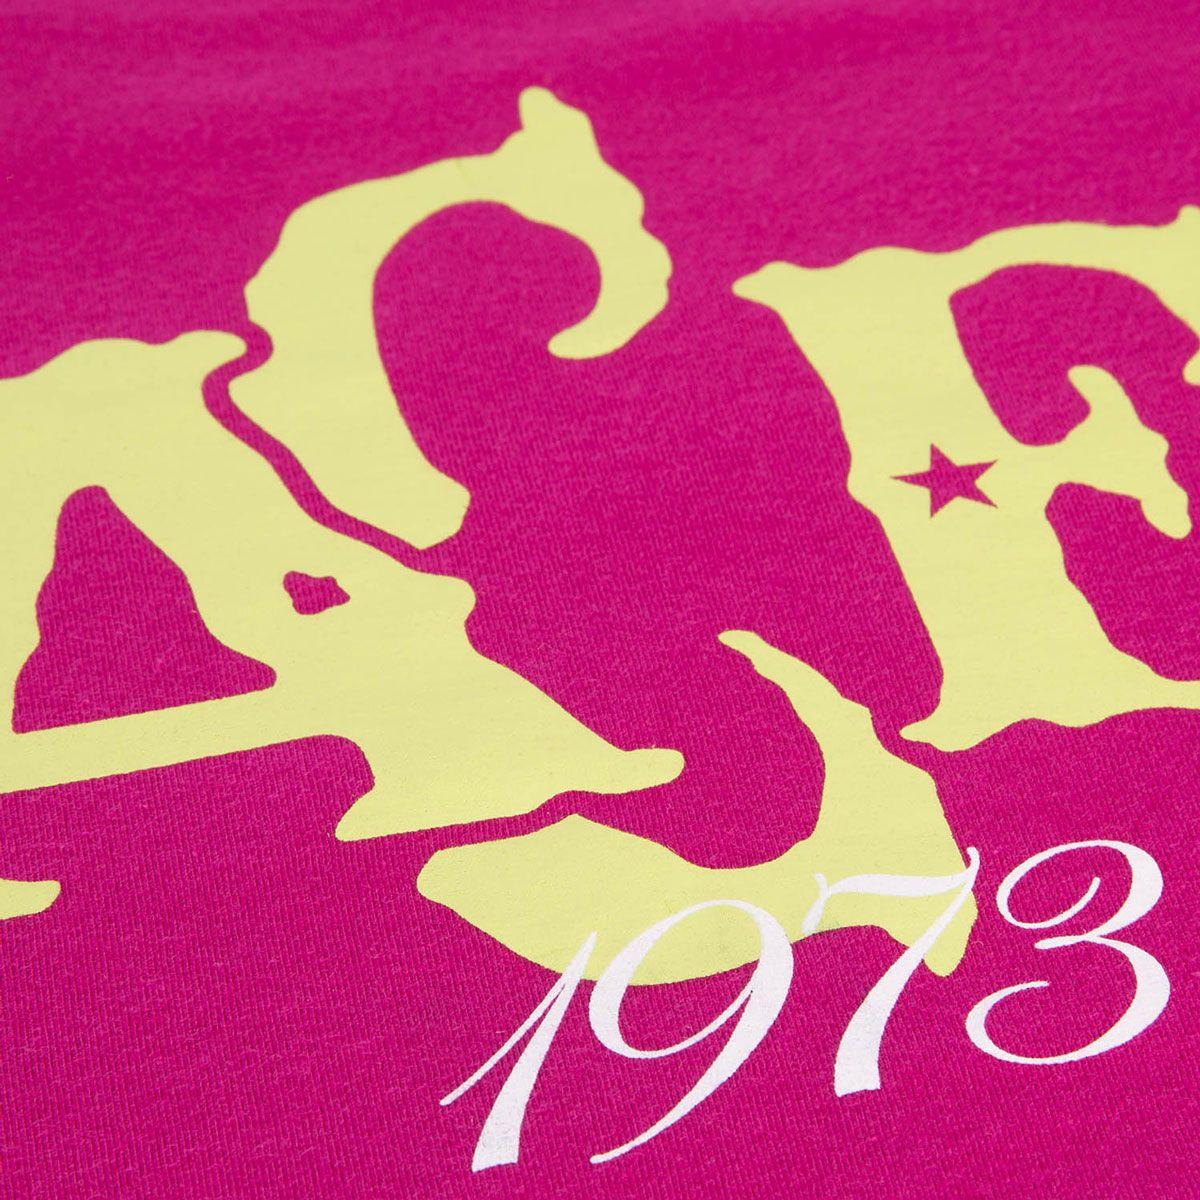 Camisa Casual Baby Look Retrô Gol Chapecoense Torcedor 1973 Pink